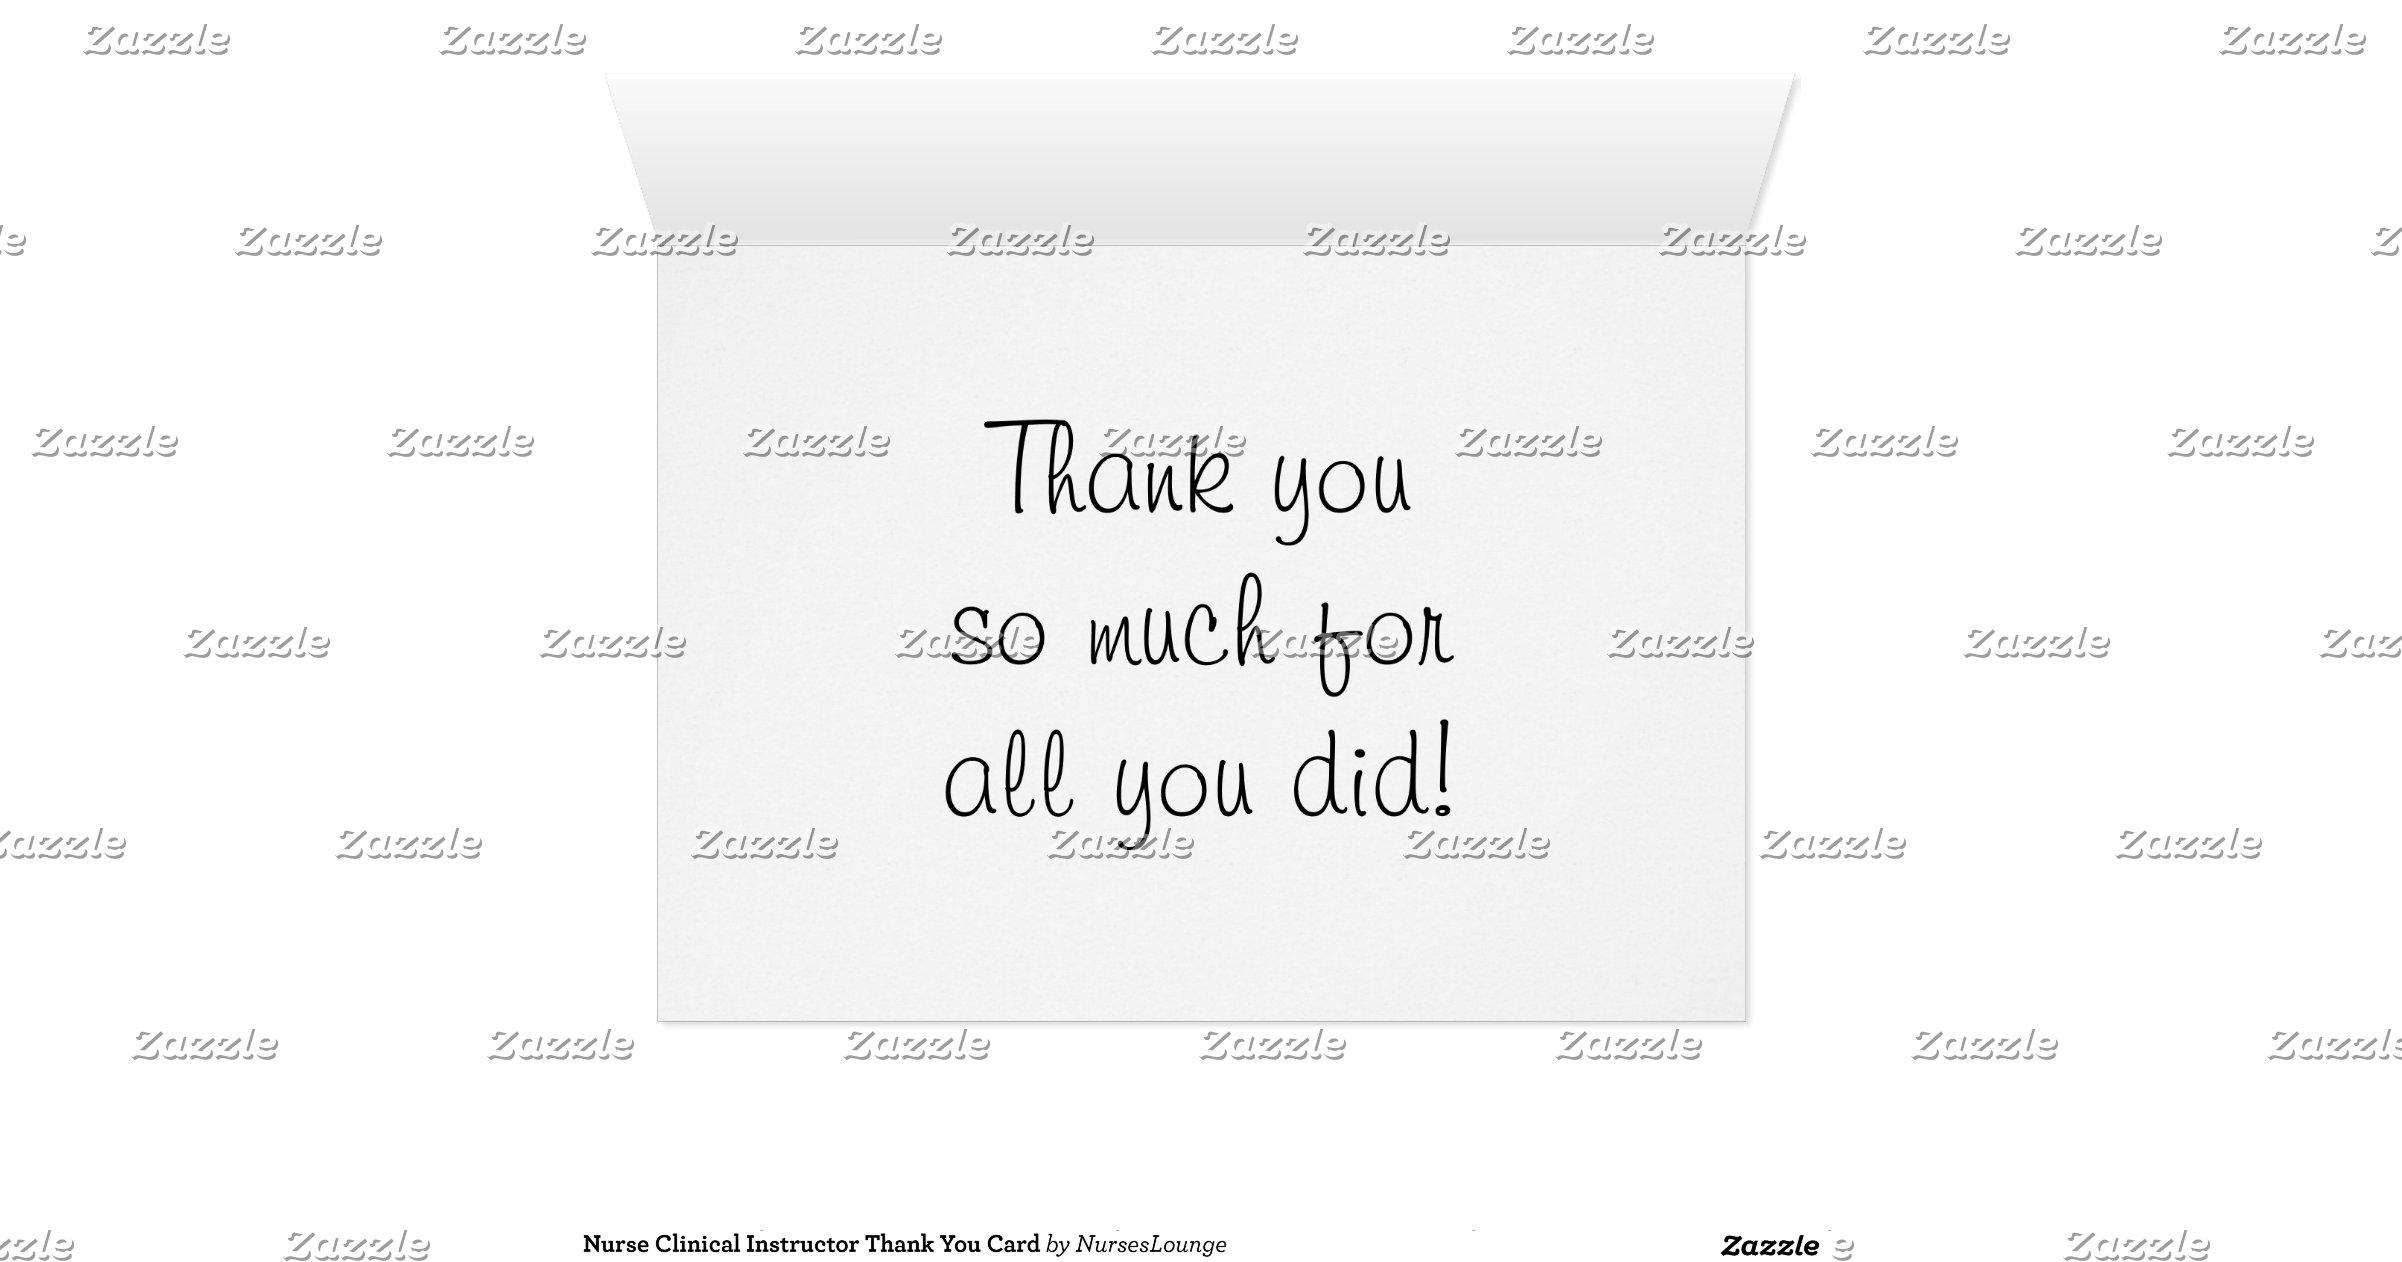 nurse_clinical_instructor_thank_you_card